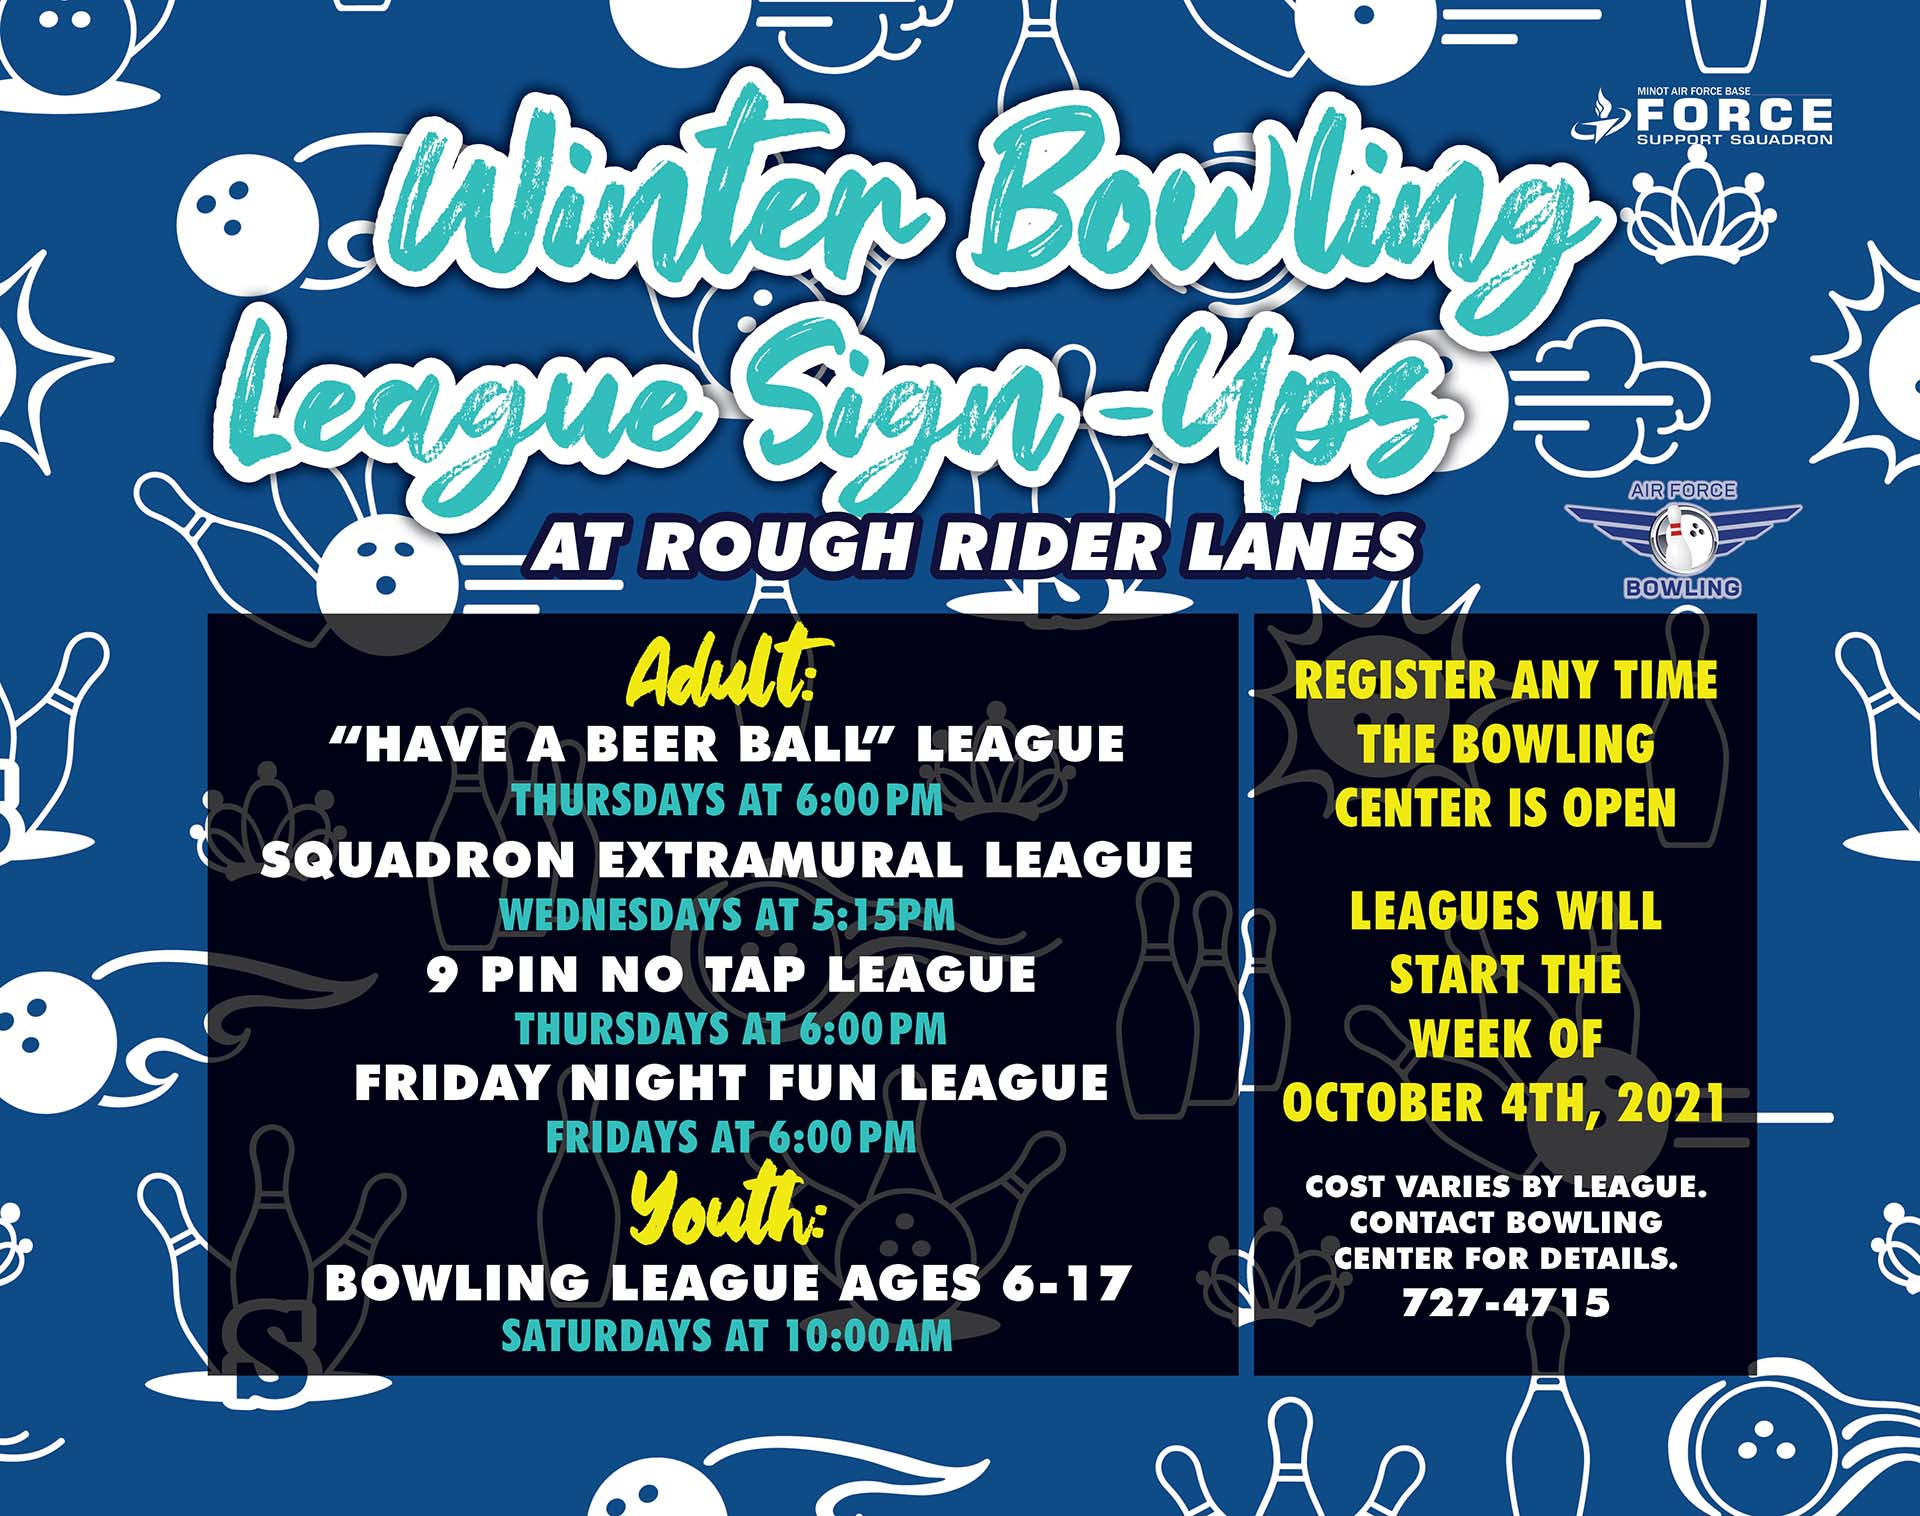 09.01-03.31 WInter Bowling Leagues